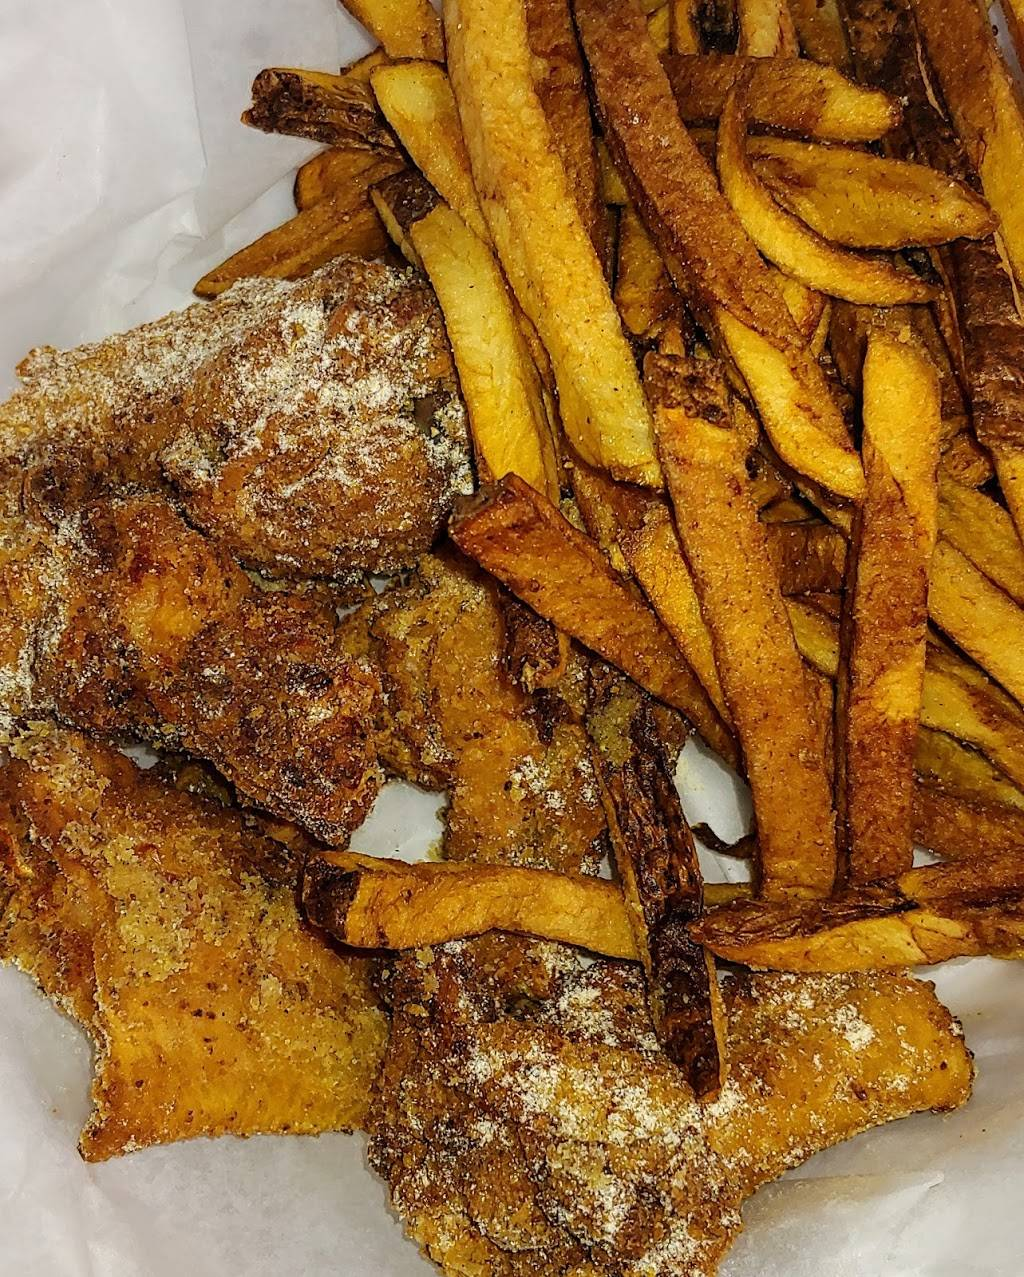 Chillaxx | restaurant | 918 Cherry Ave NE, Canton, OH 44704, USA | 3309158741 OR +1 330-915-8741